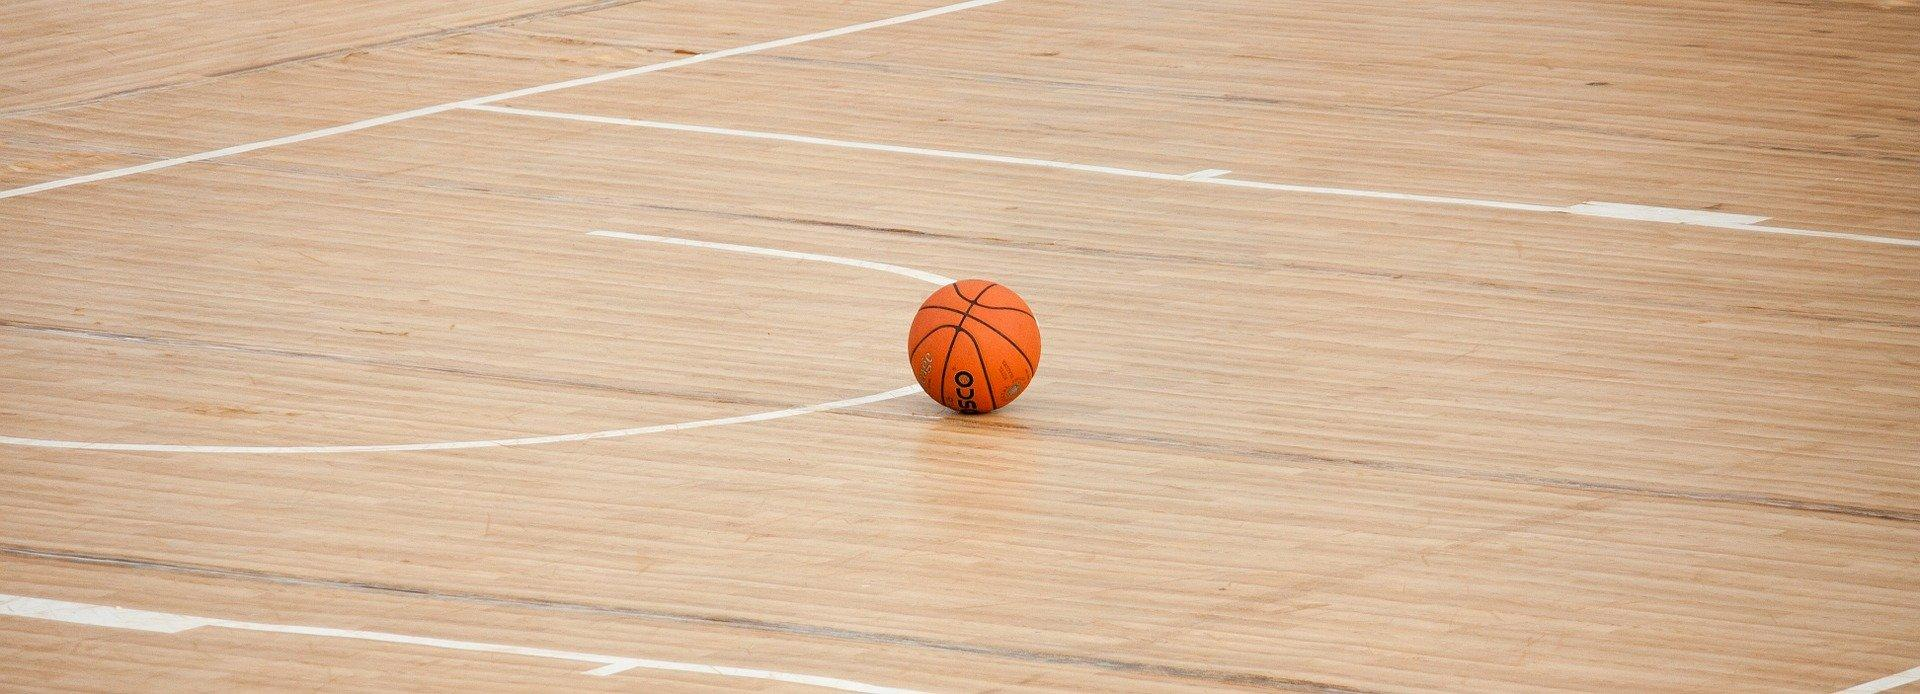 Bucks Win NBA Title, Their First in Half-Century | WXPR